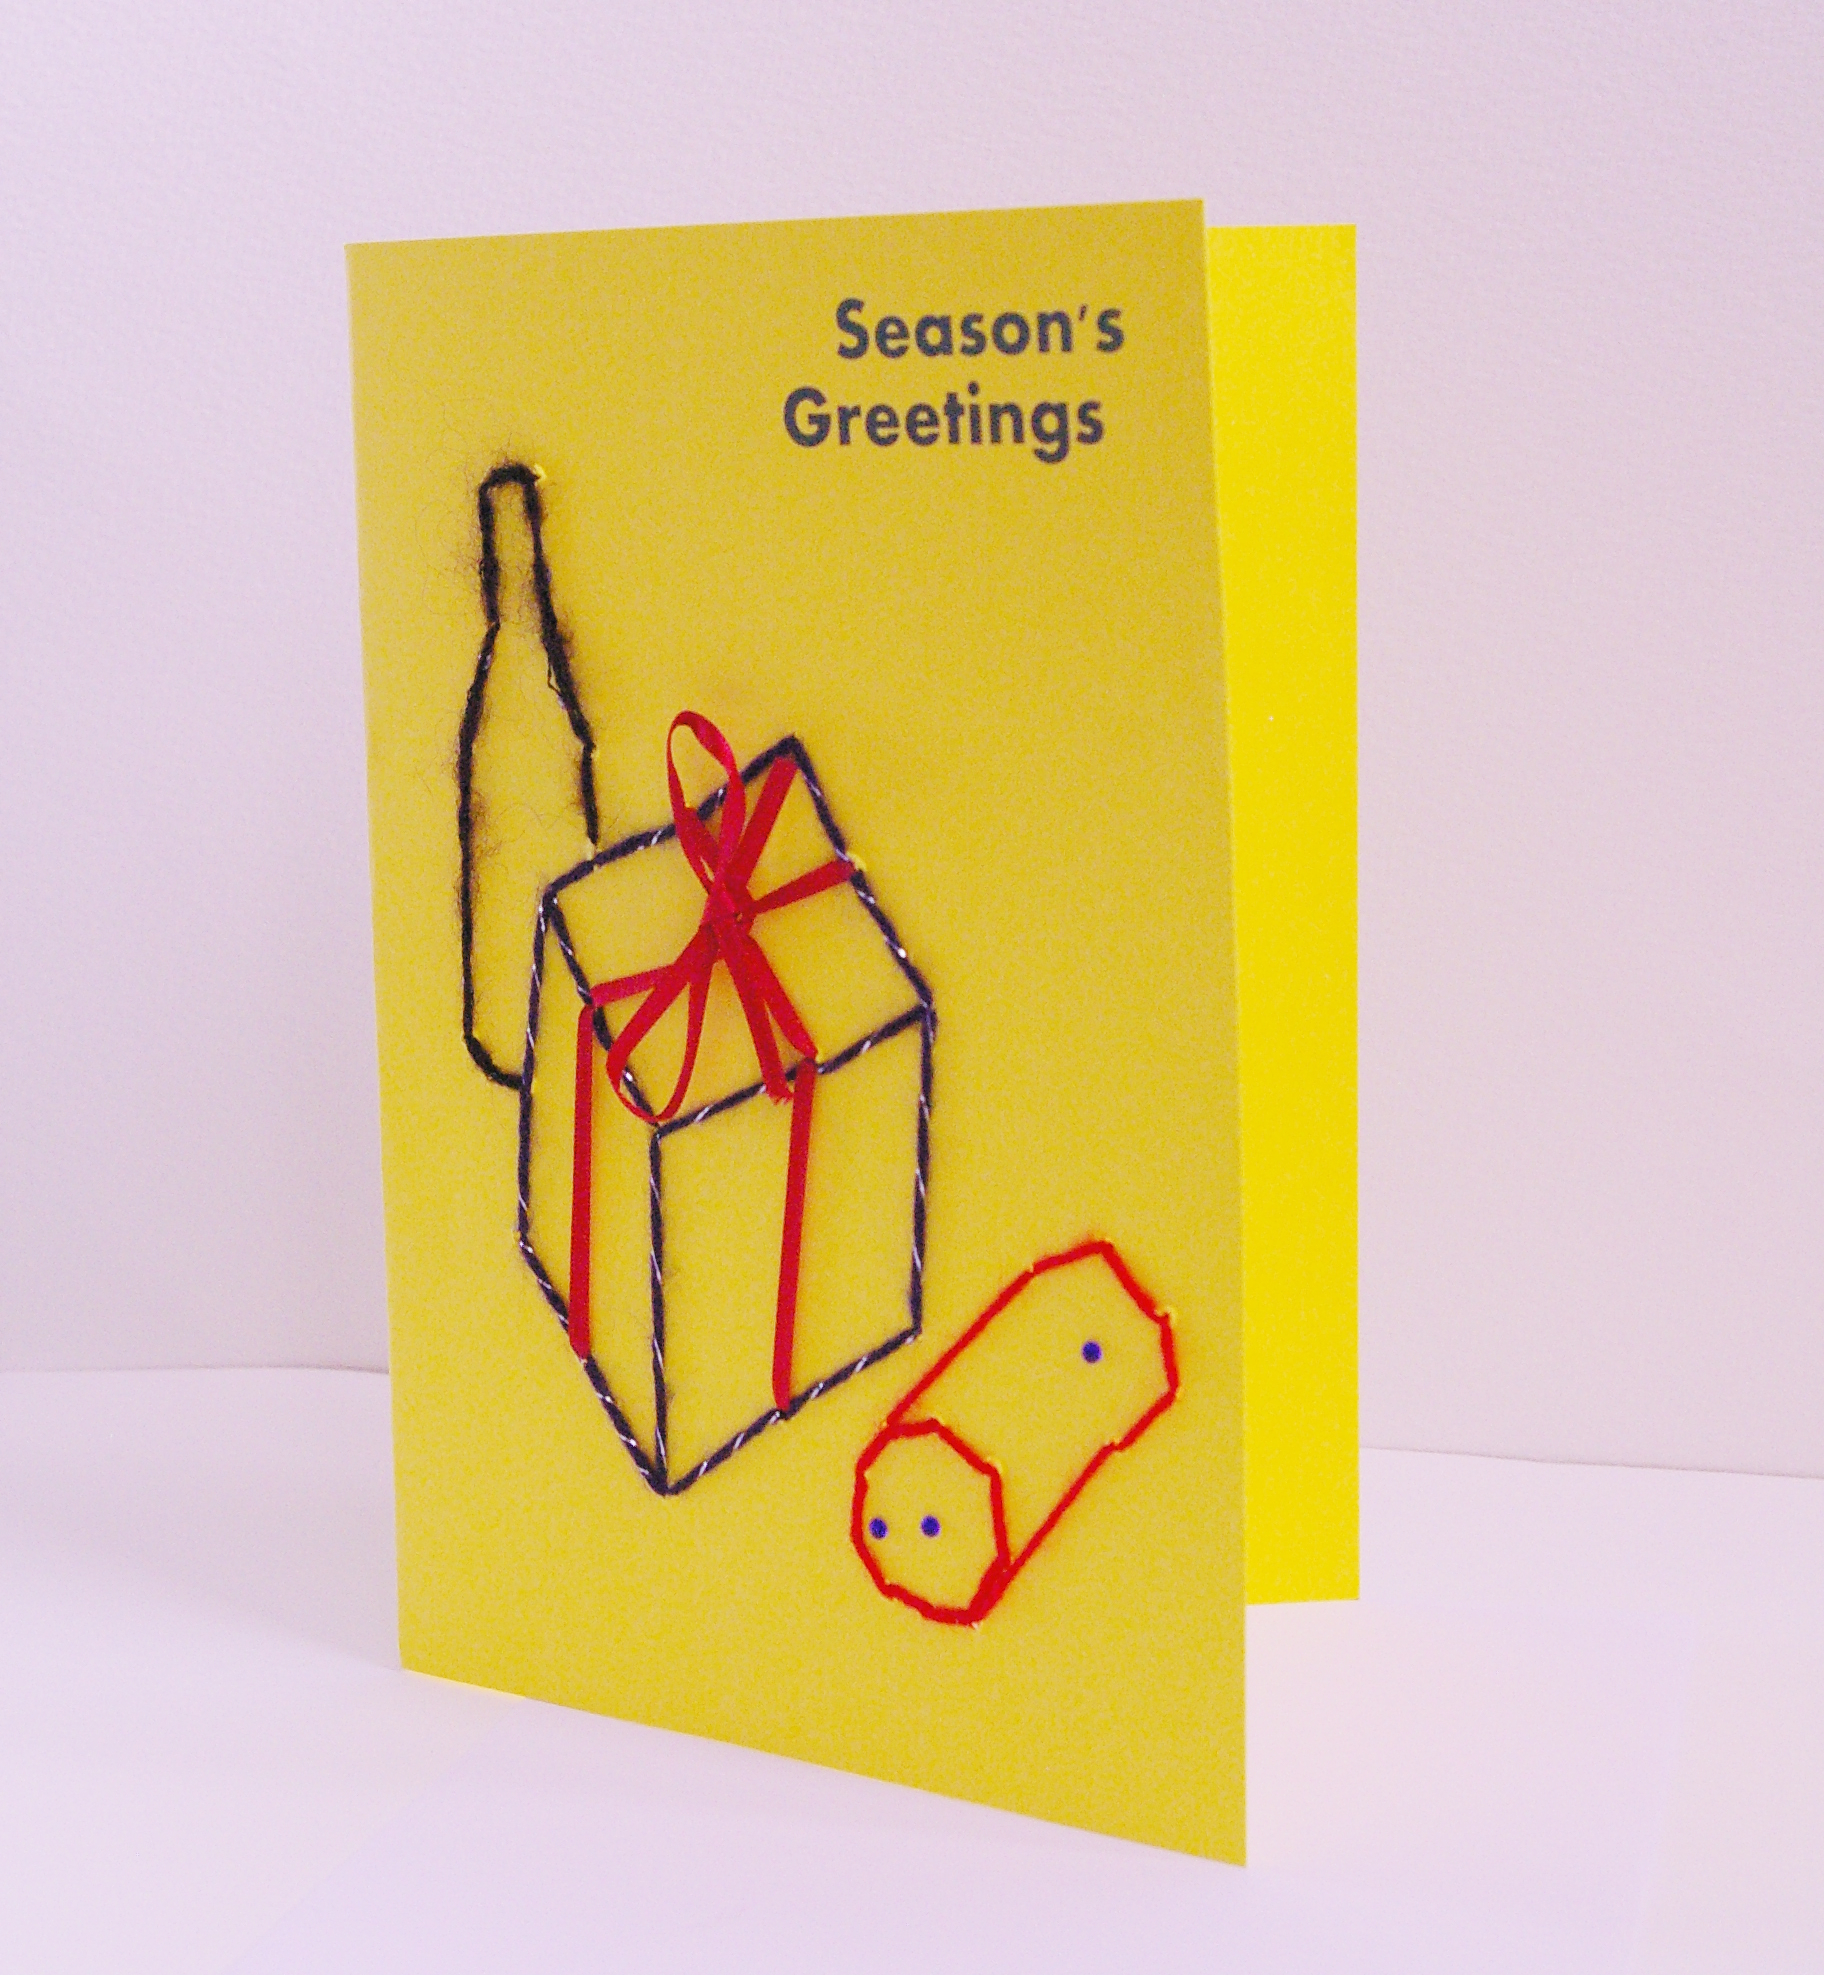 portrait style yellow card pressies image season's greetings card